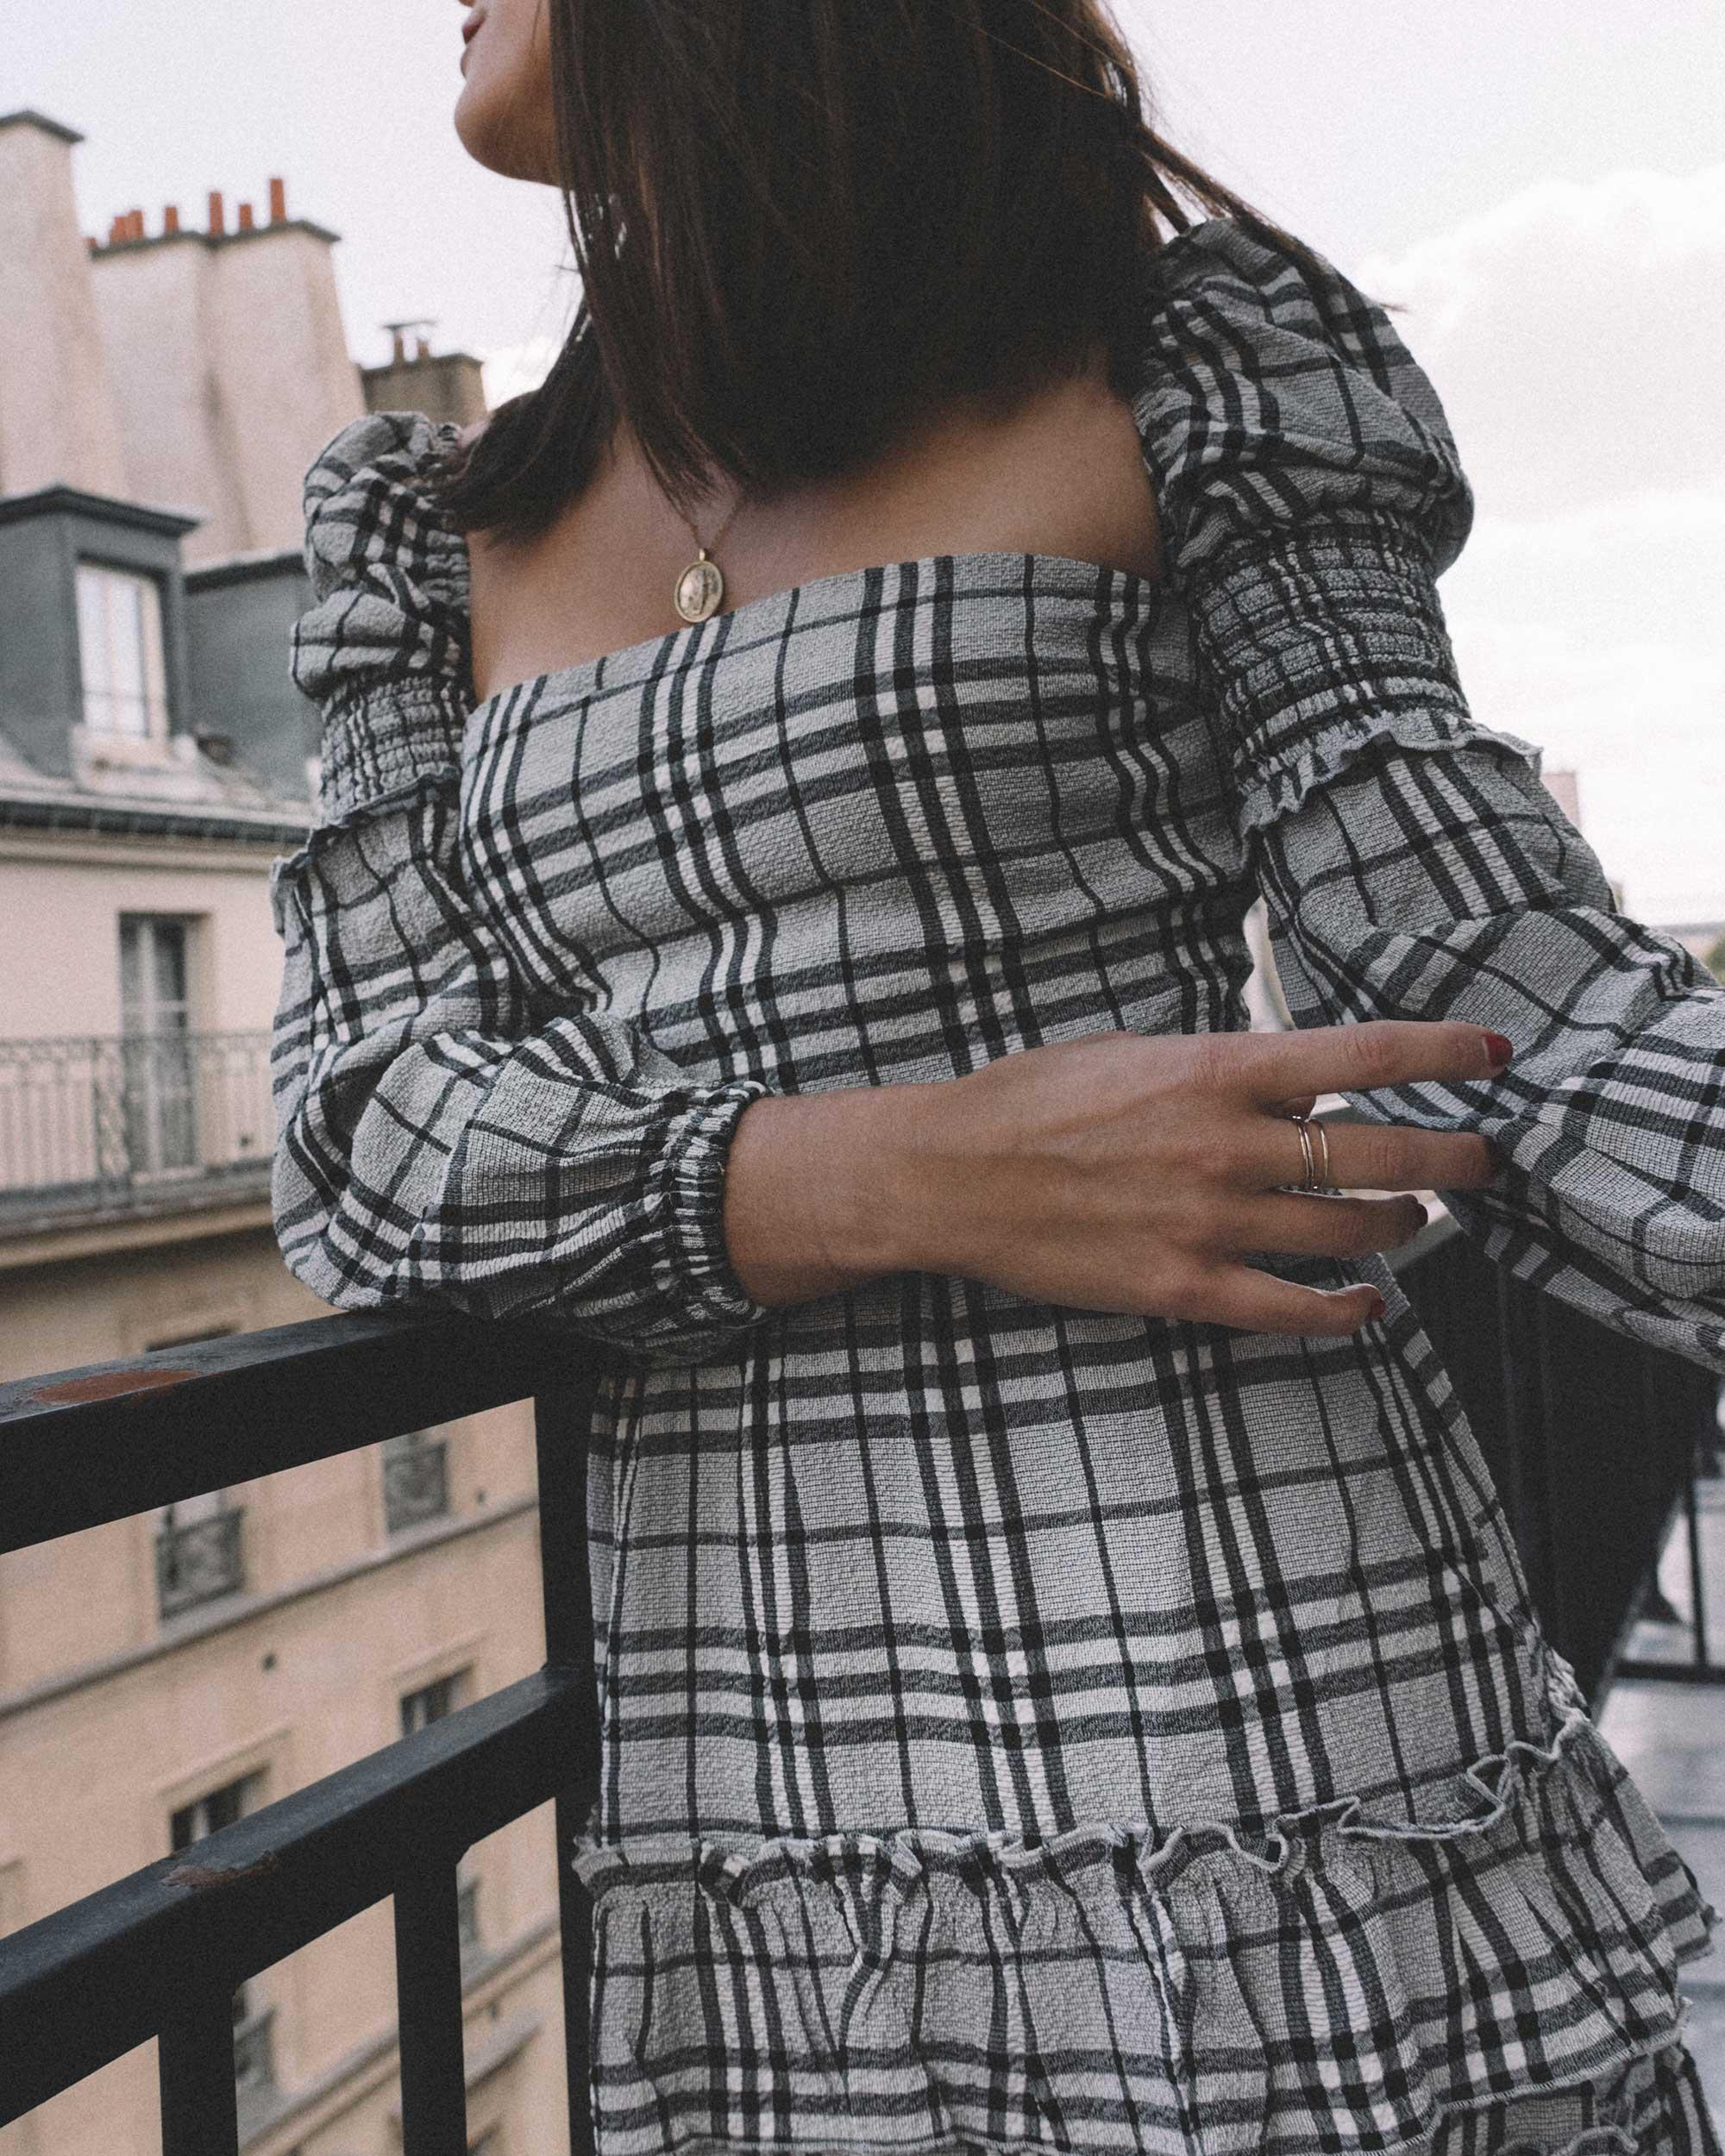 MAJORELLE Plaid Long Sleeve Dress Paris Girl Balcony Outfit6.jpg